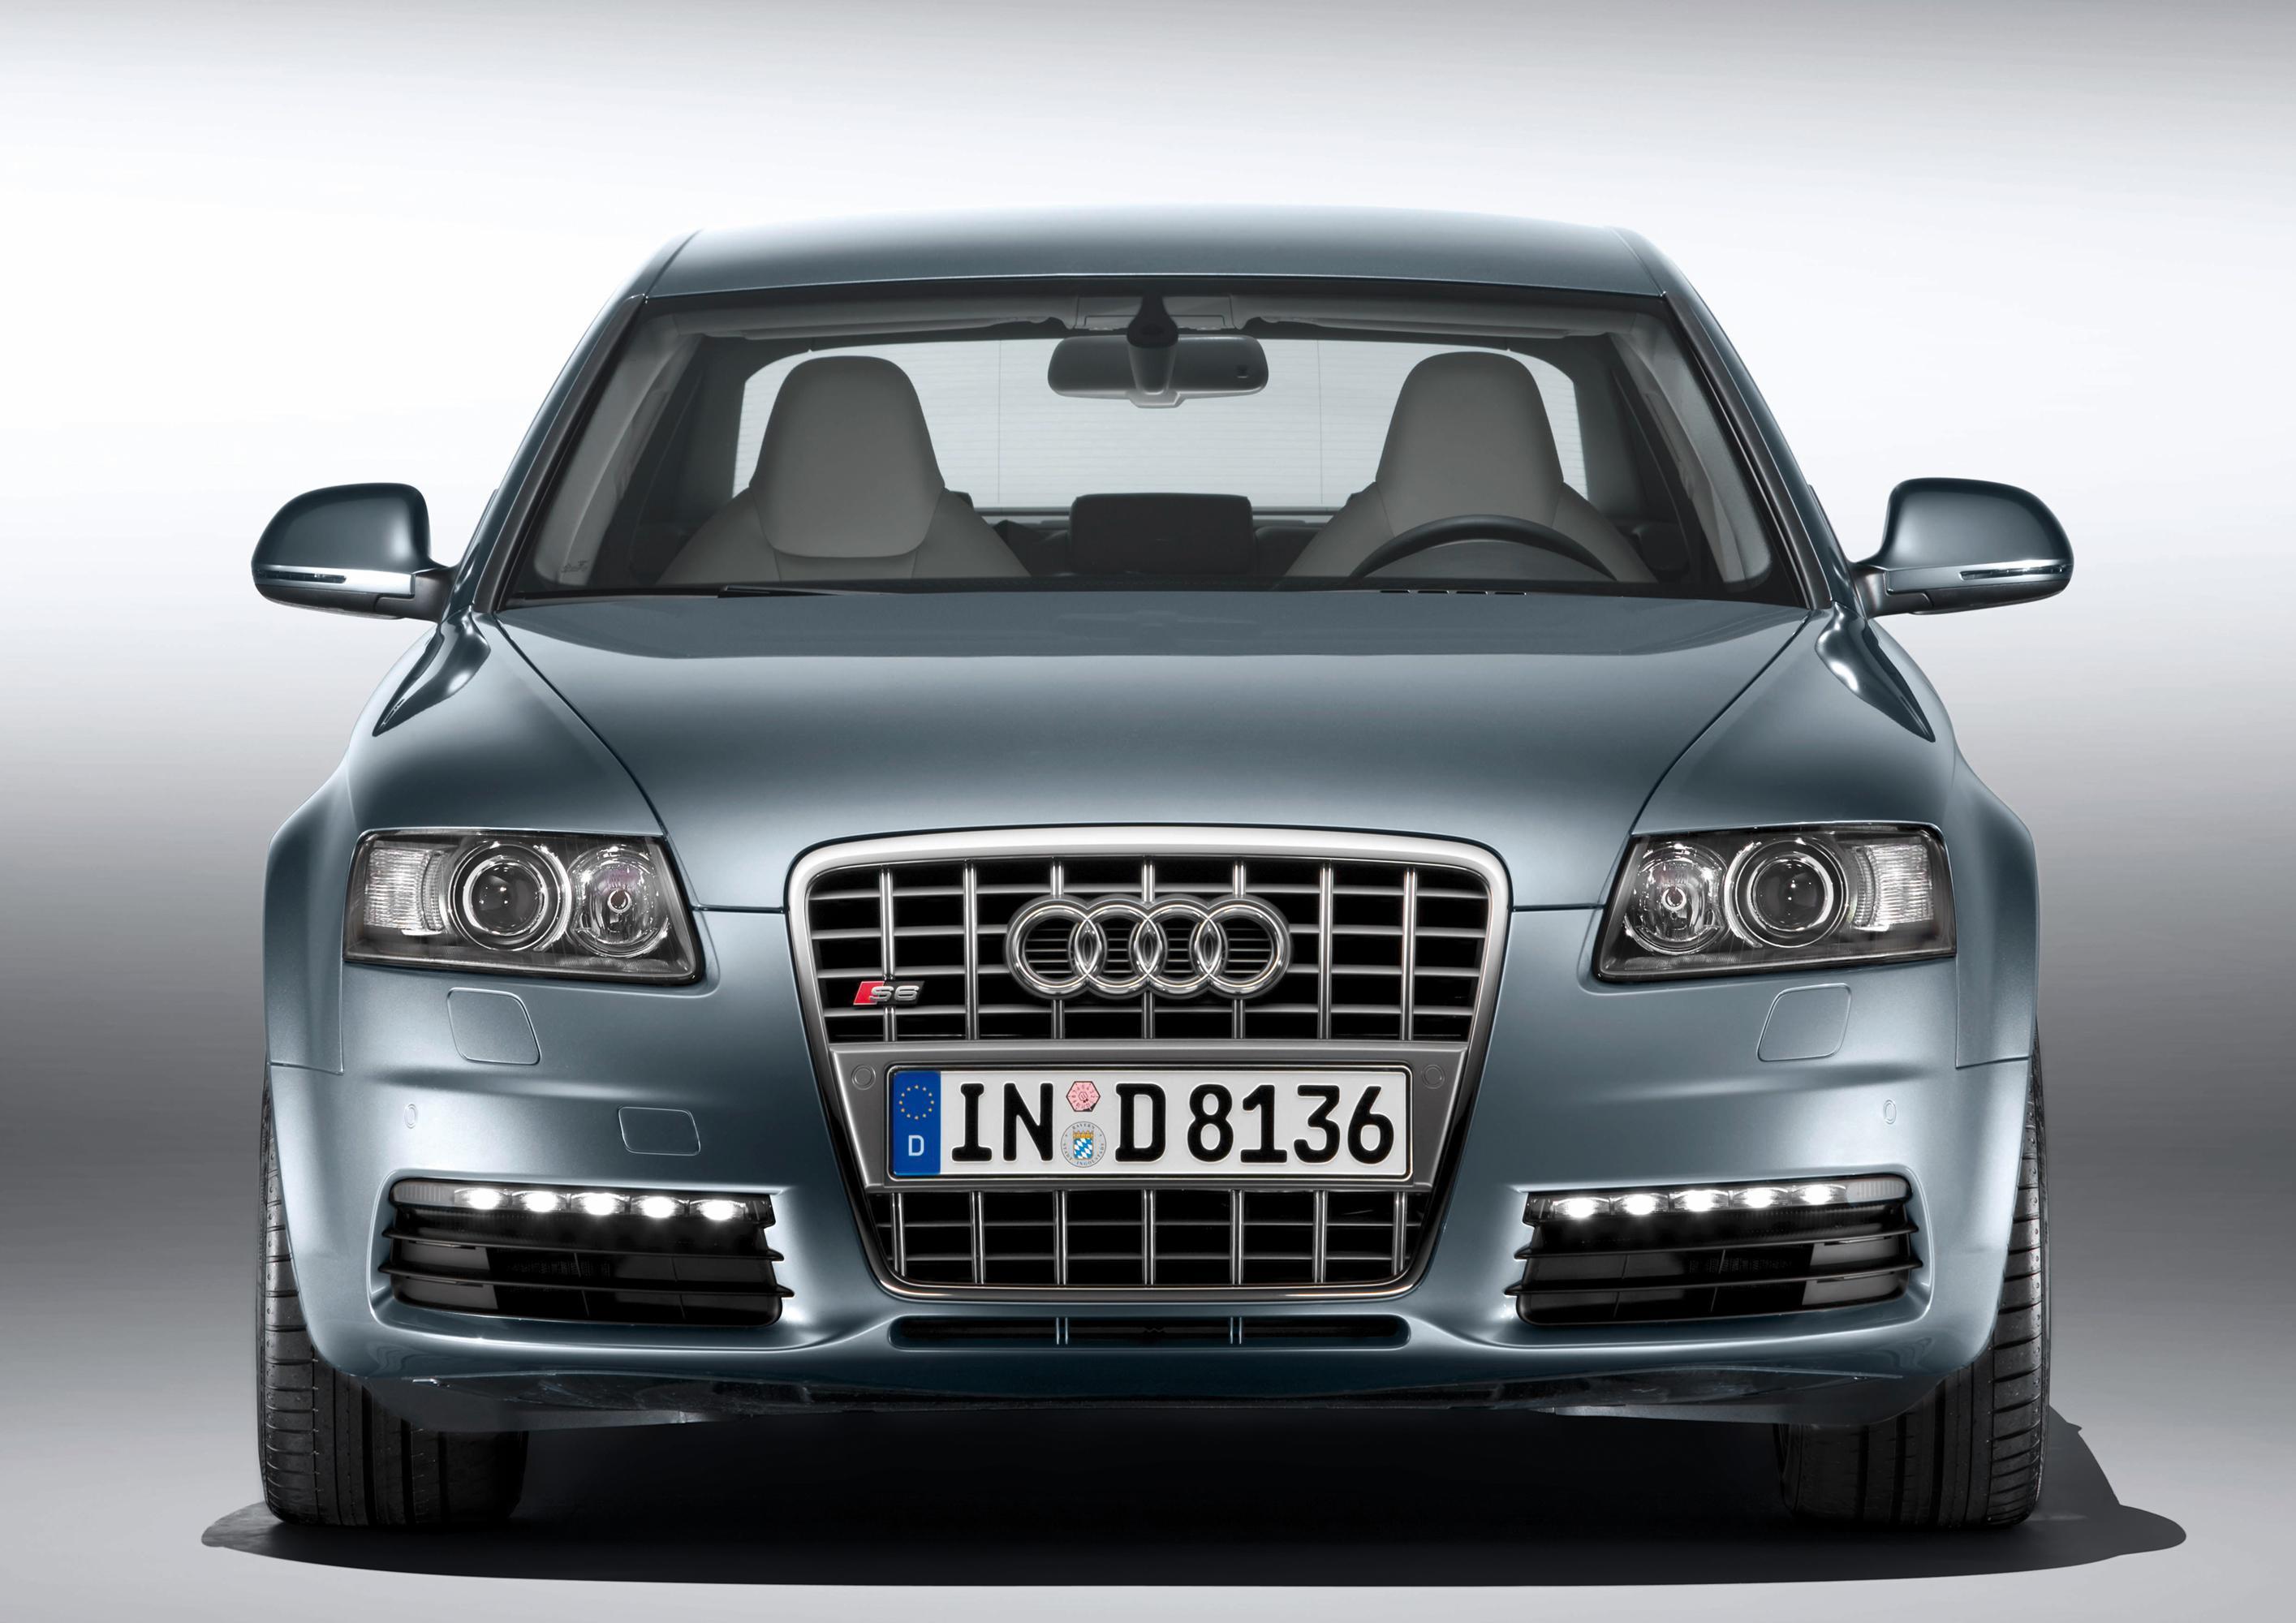 2010 Audi S6 Image 10